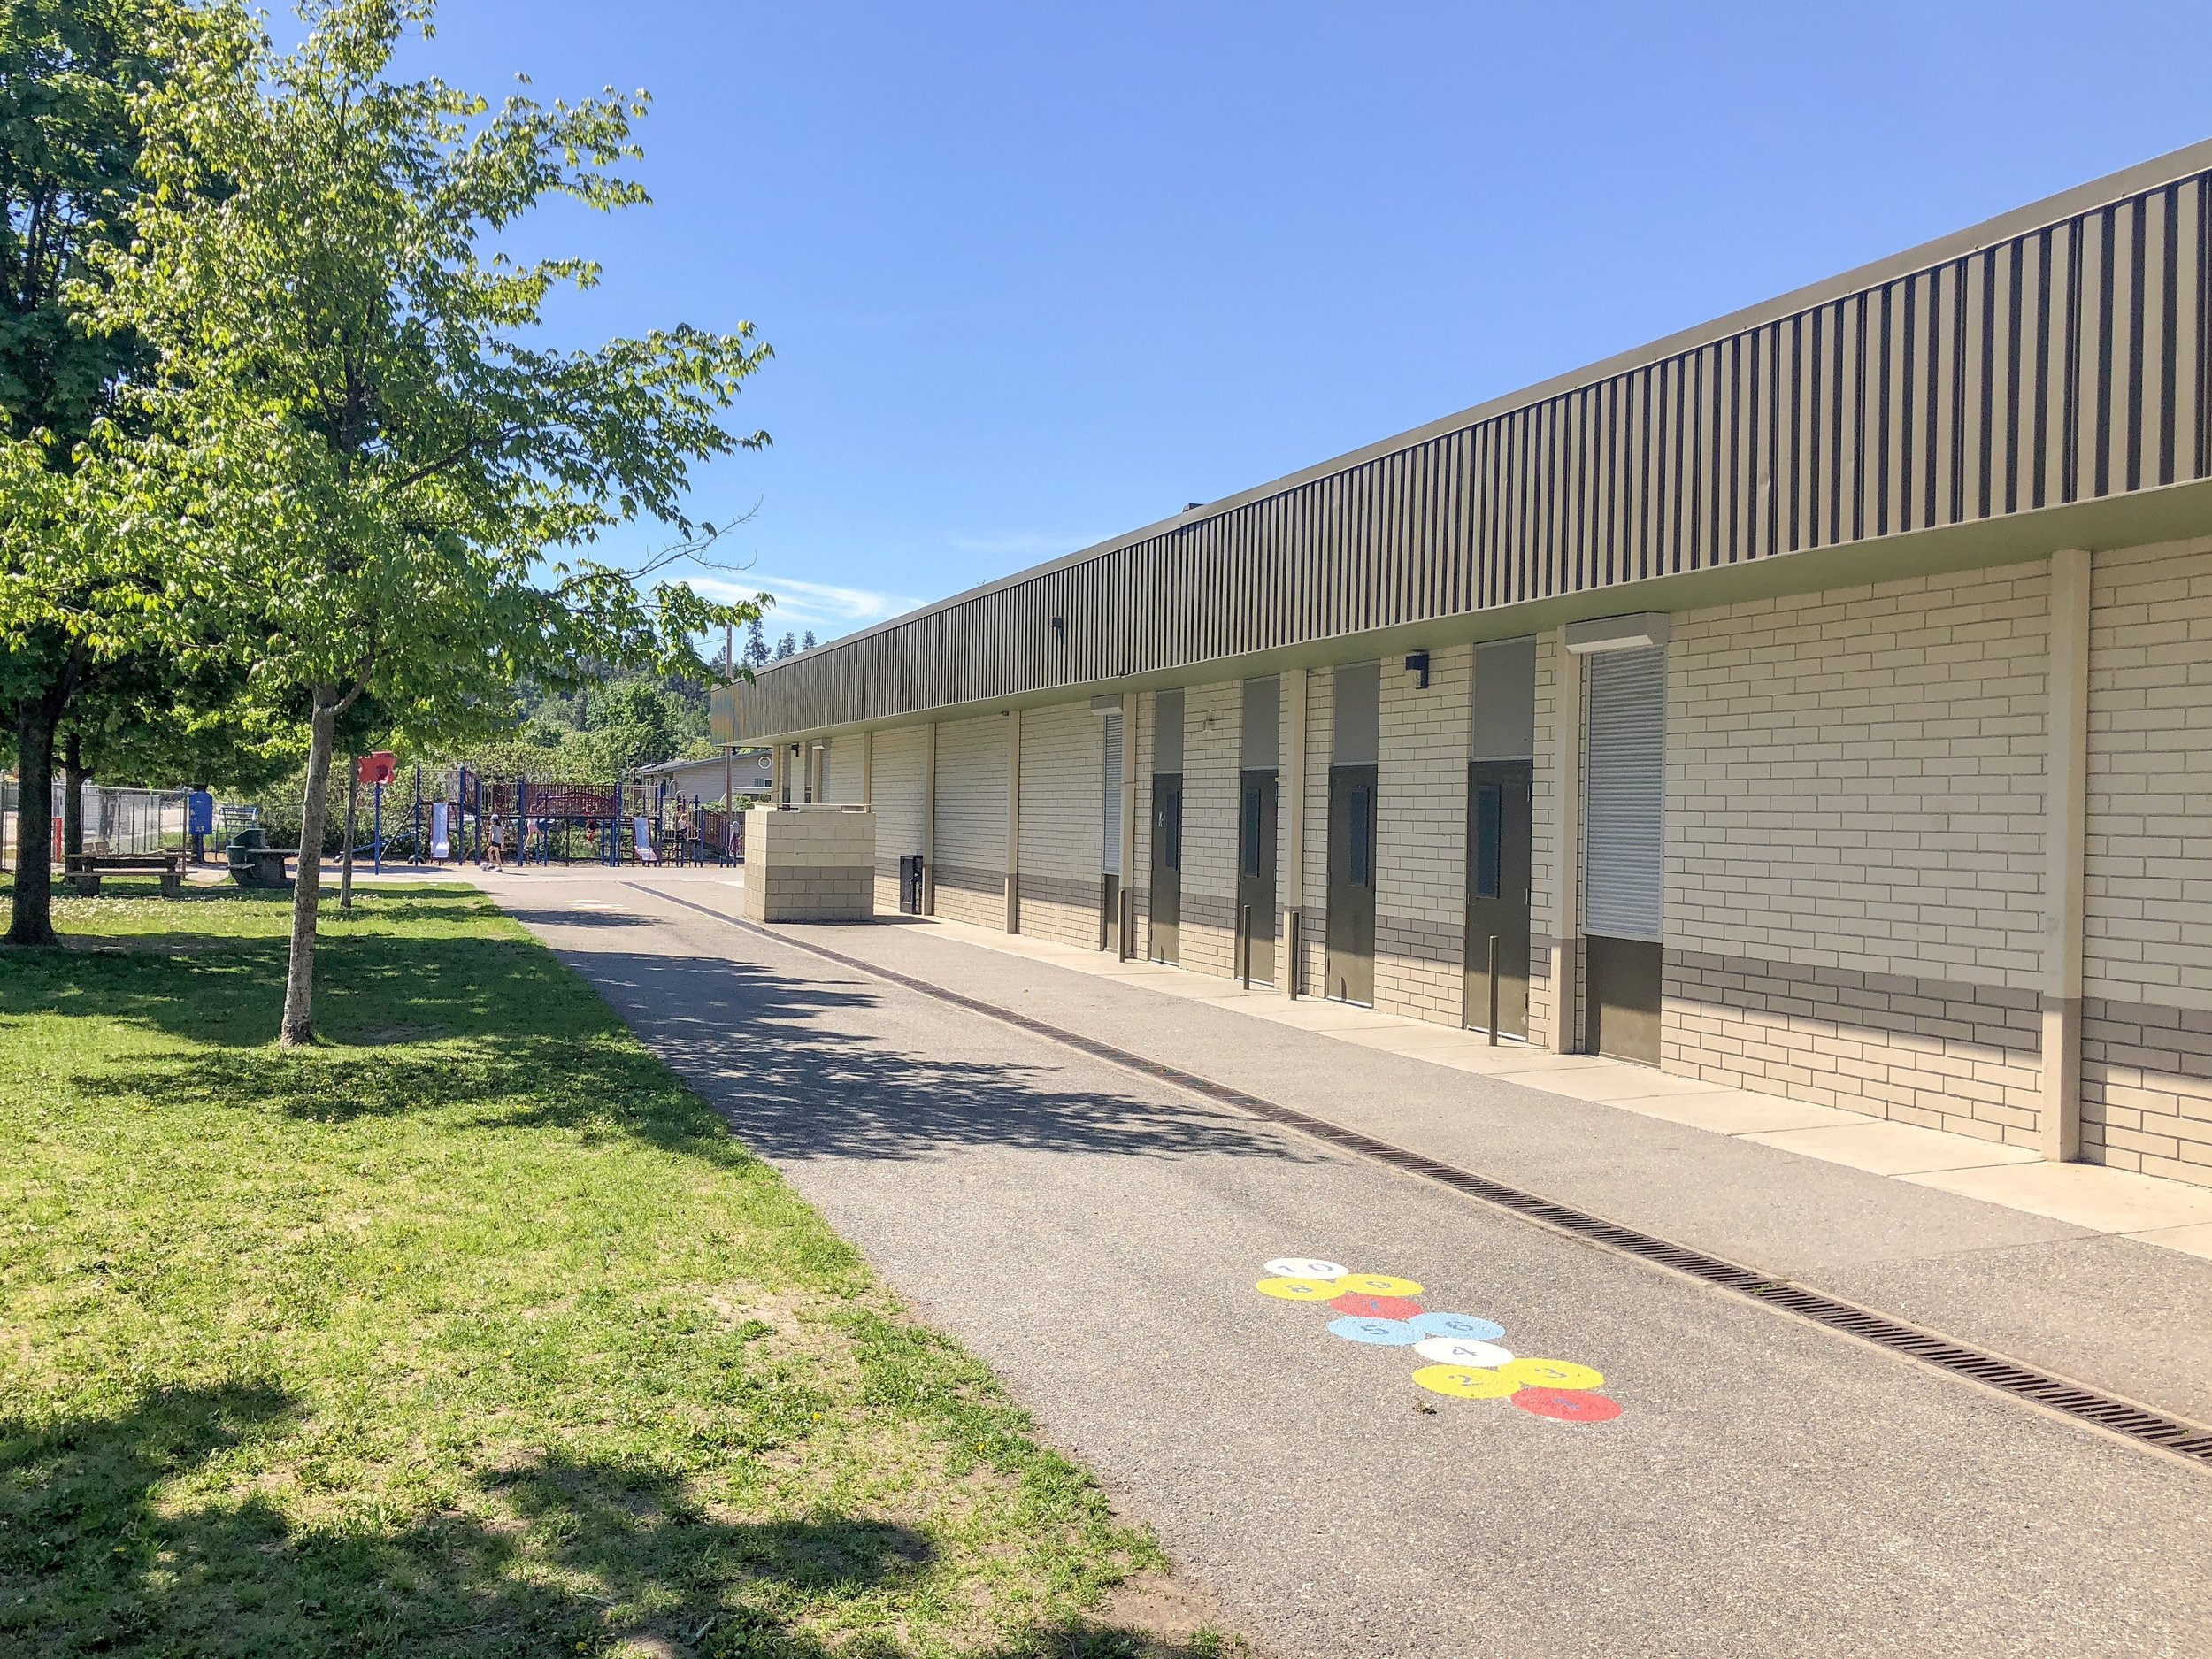 springvalley-elementary-school-rutland-neighbourhood-kelowna-joshua-elliott-02.jpg